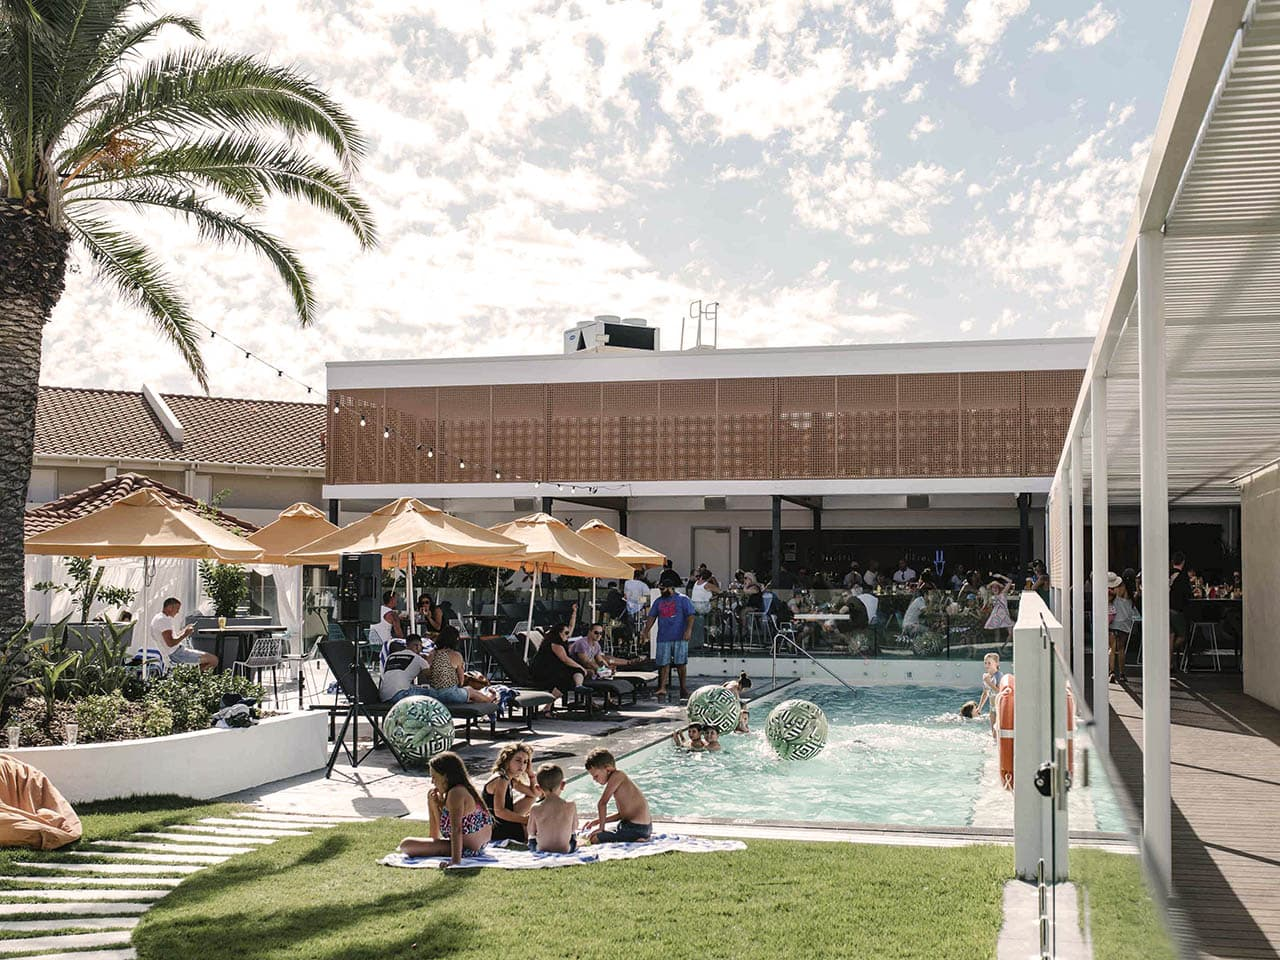 Pool venue hire